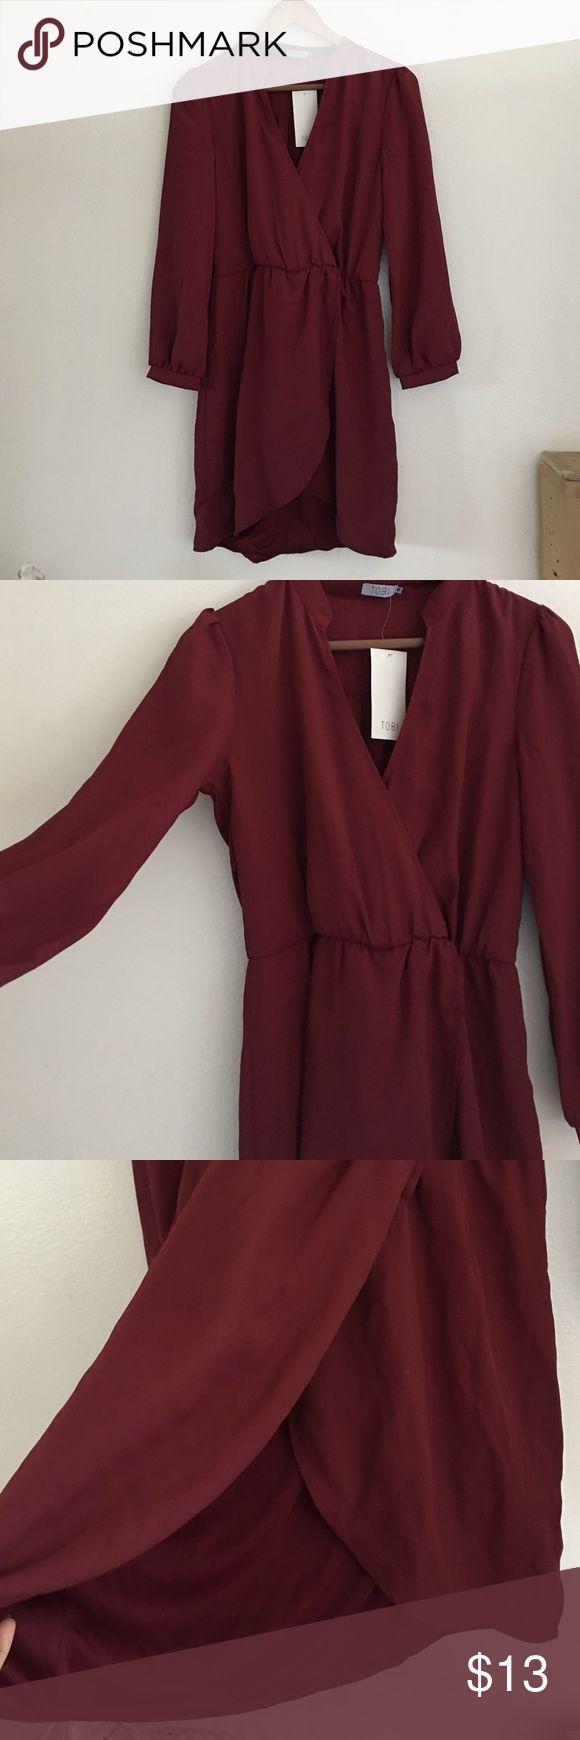 TOBI dress. Maroon long sleeve dress. Stretchy waistband. NEW WITH TAGS! Tobi Dresses Mini